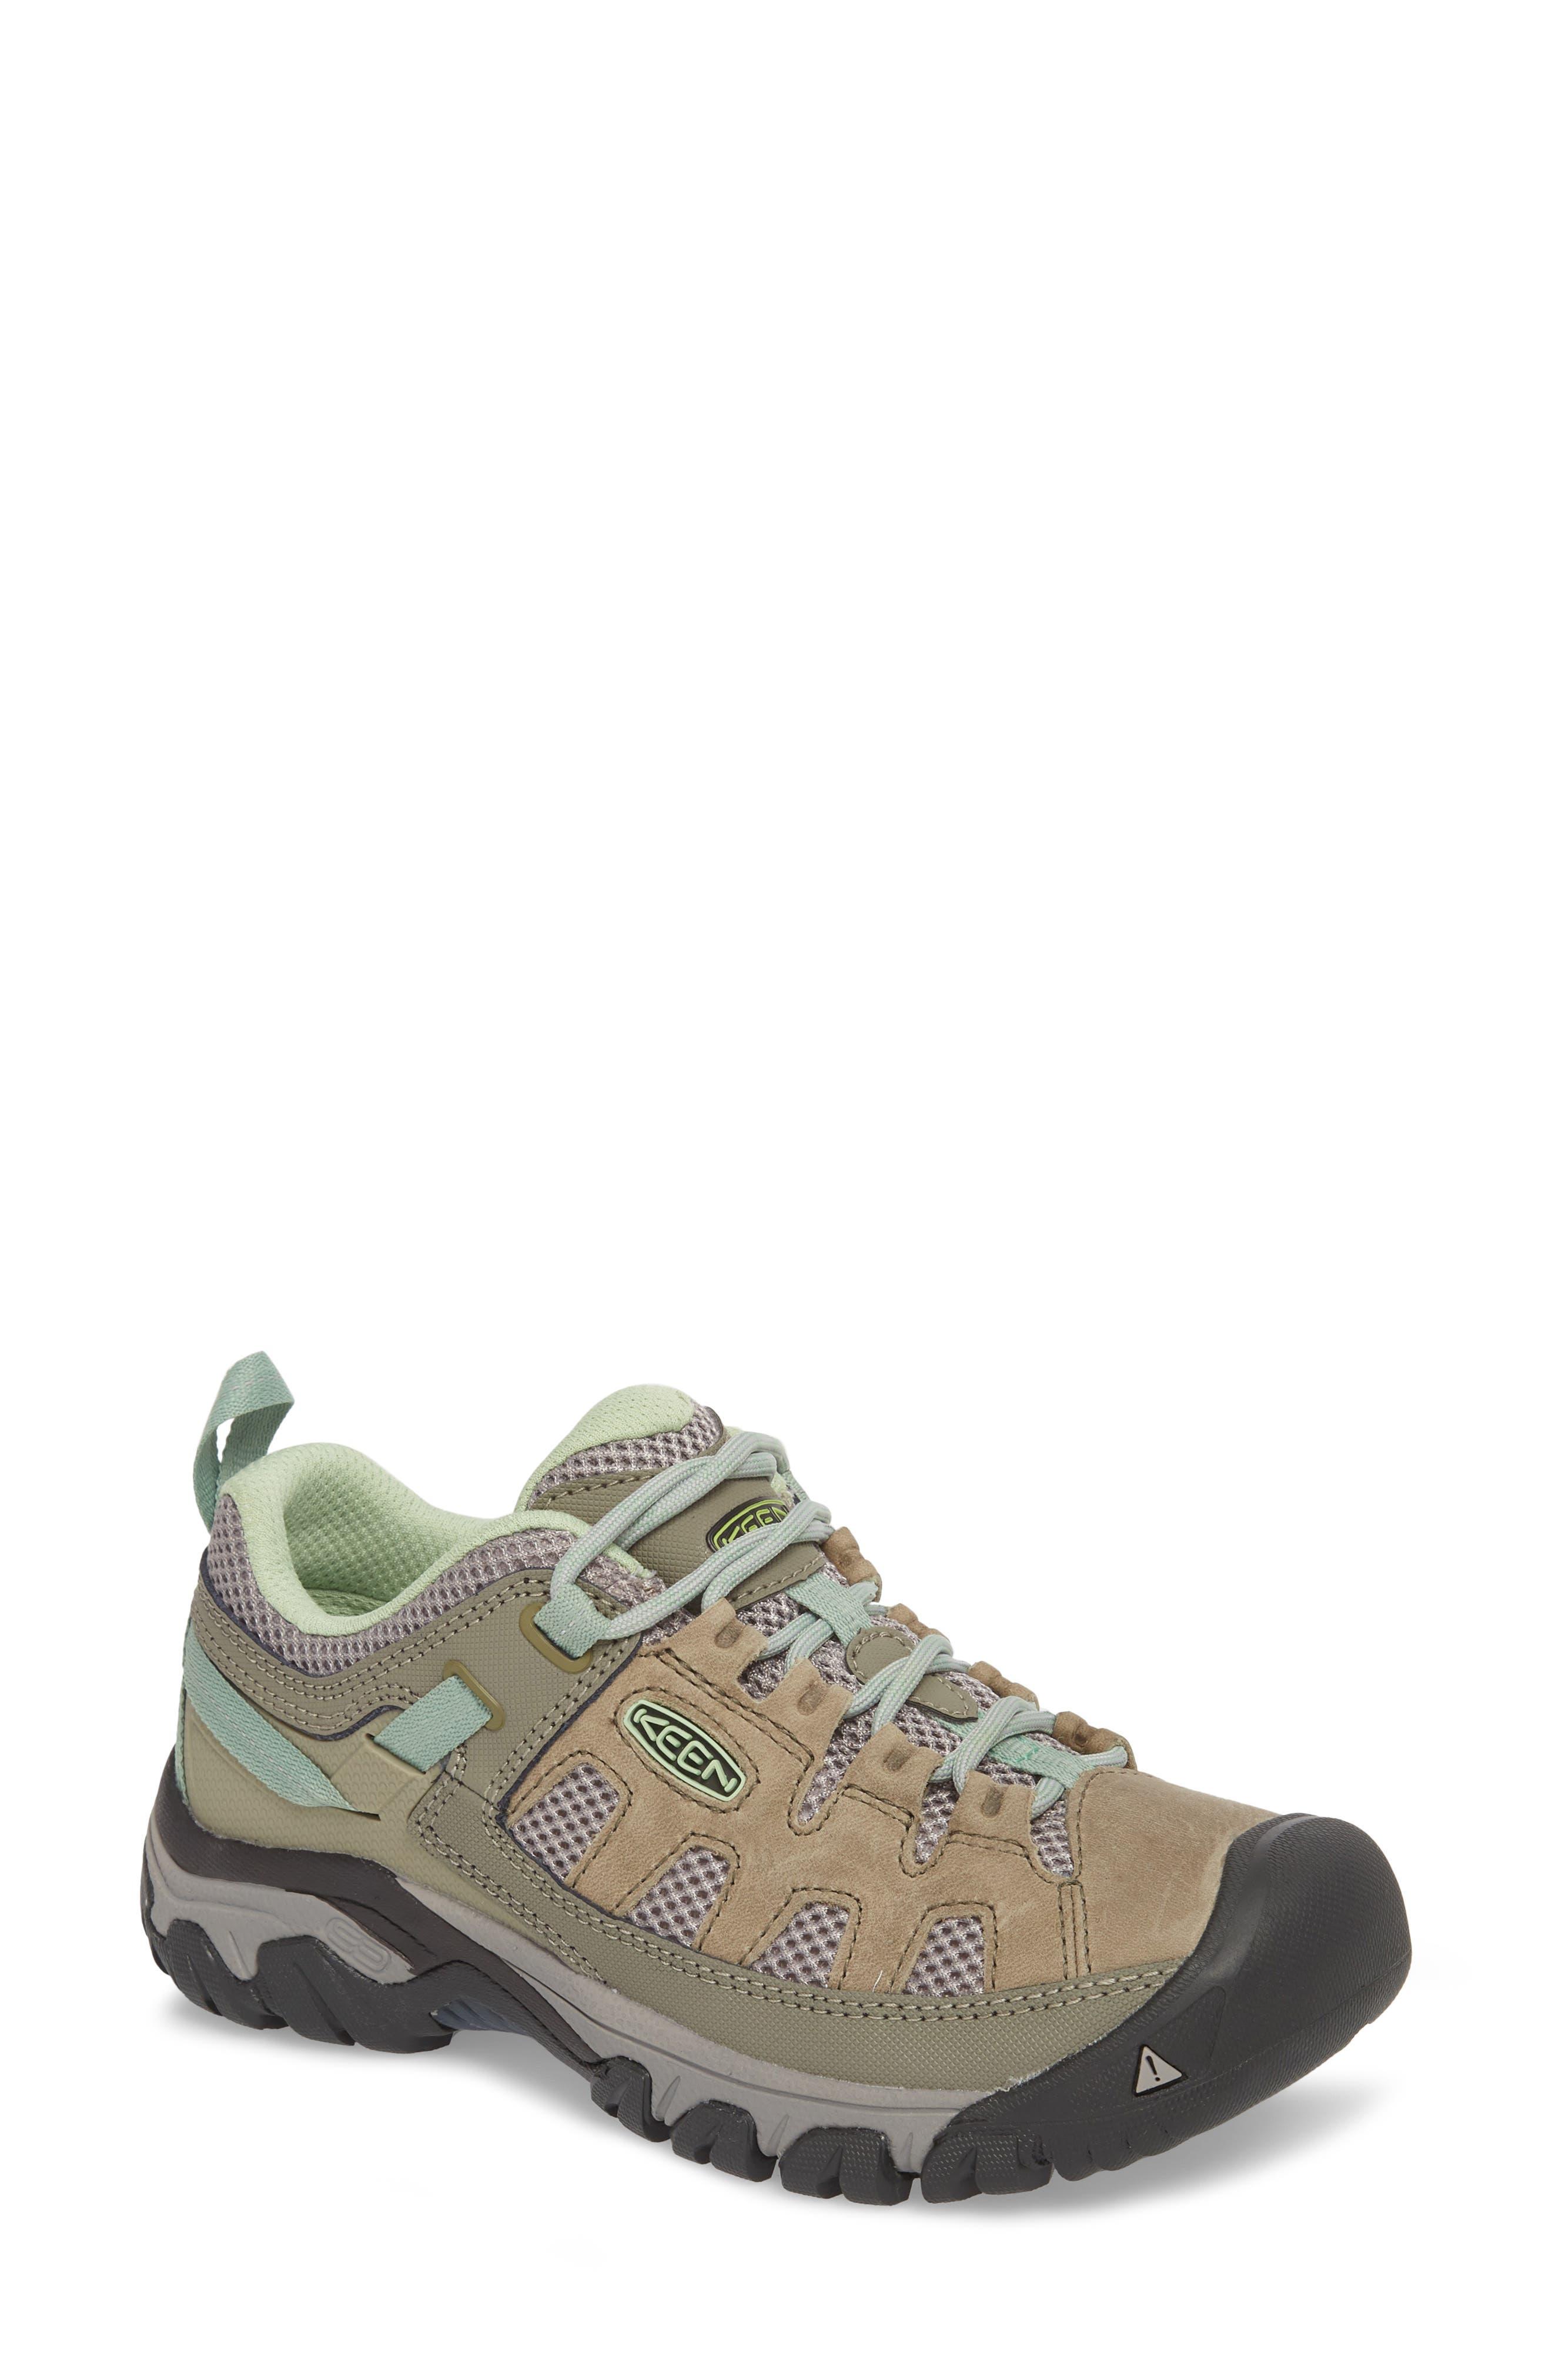 Targhee Vent Hiking Shoe,                         Main,                         color, 200